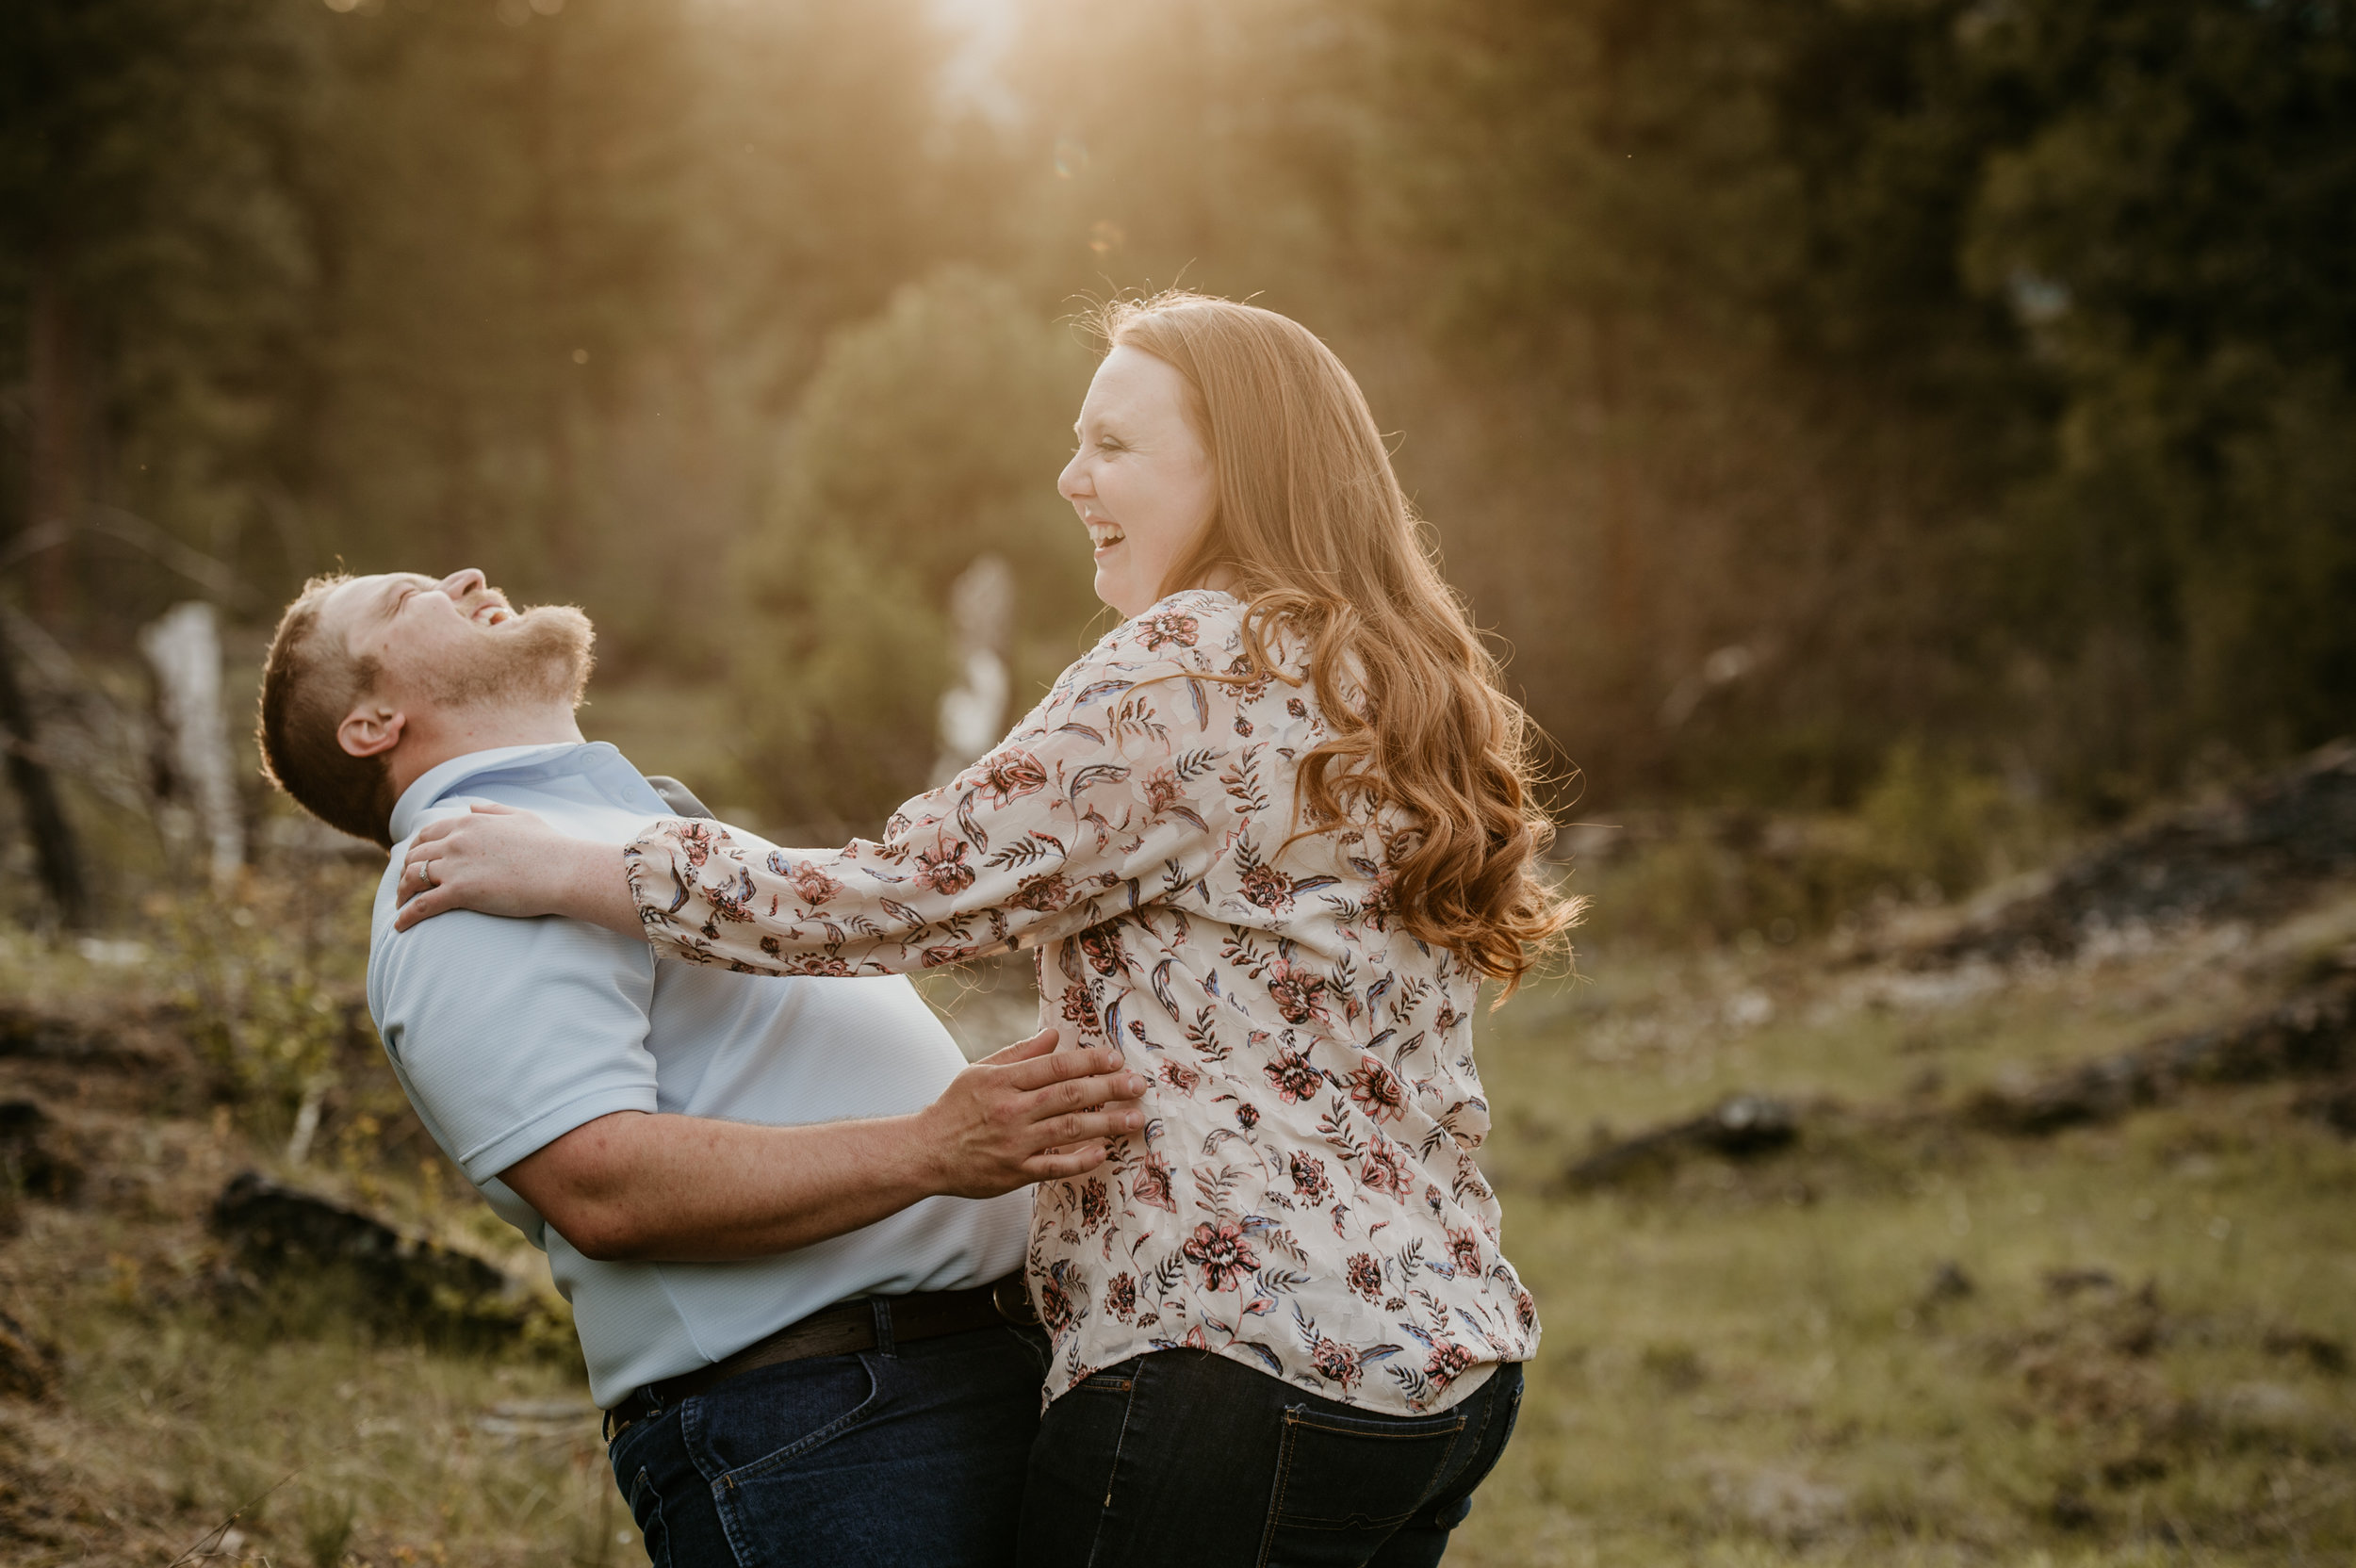 049White Raven Engagement Session_Megan & Justin_Honeybee Weddings_May 10, 2019-695.jpg